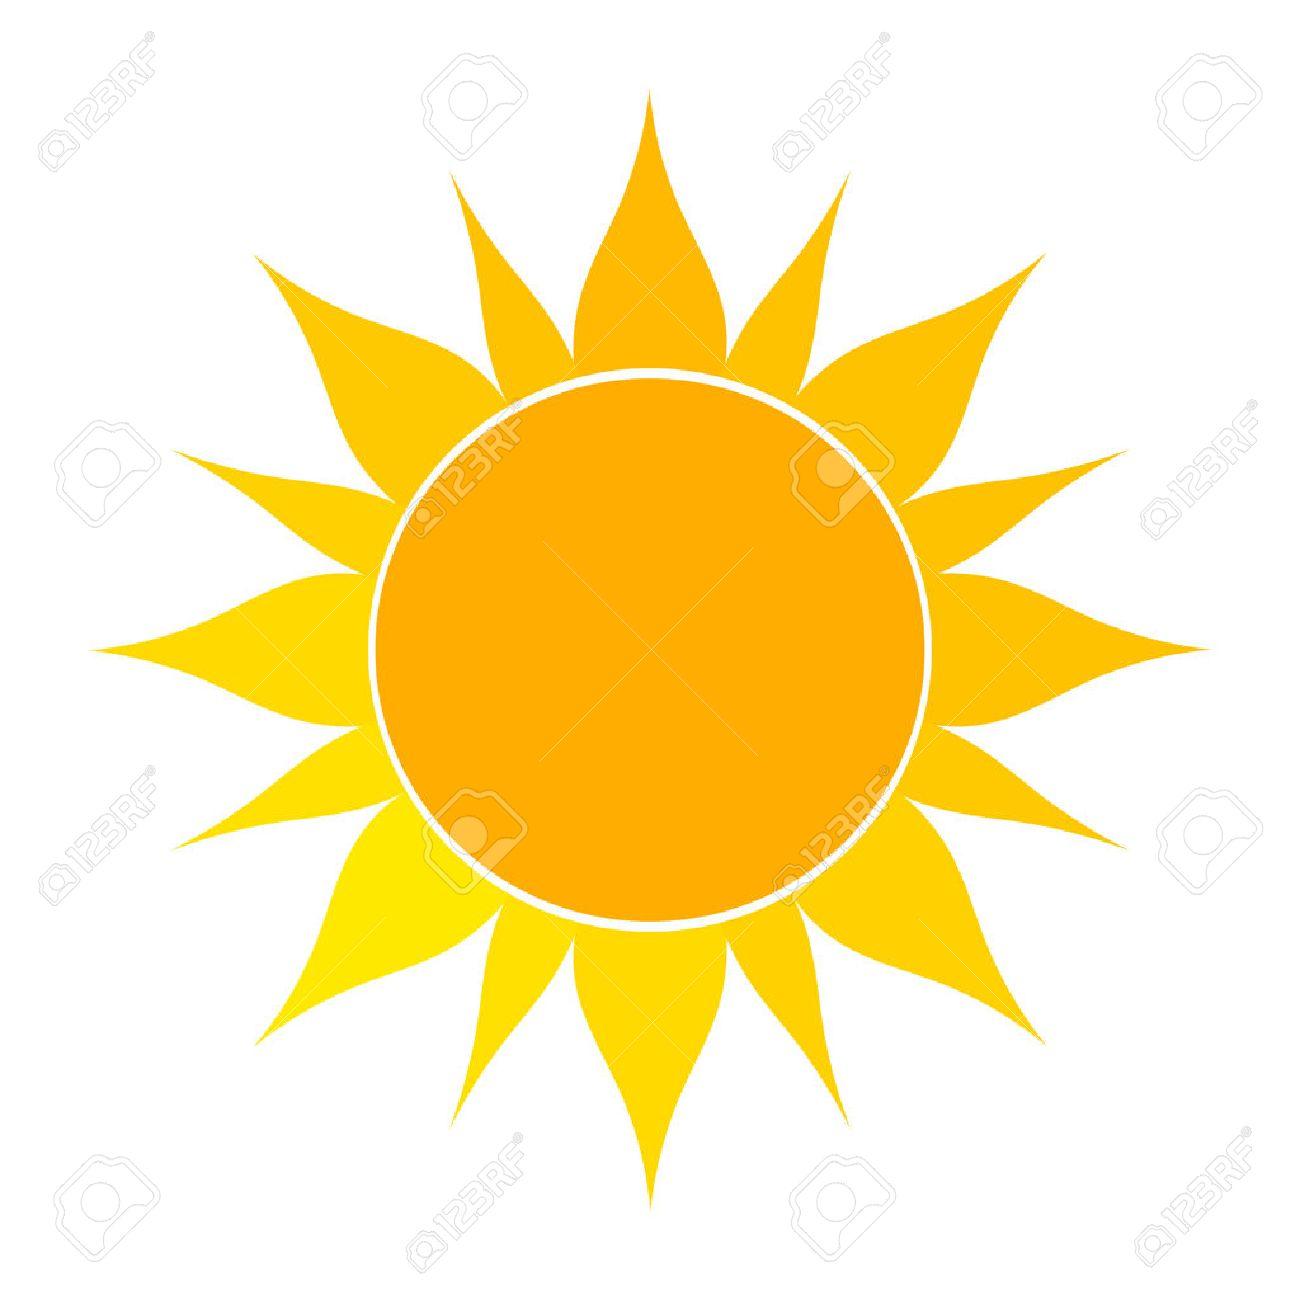 Flat sun icon. Vector illustration on white background - 47524979